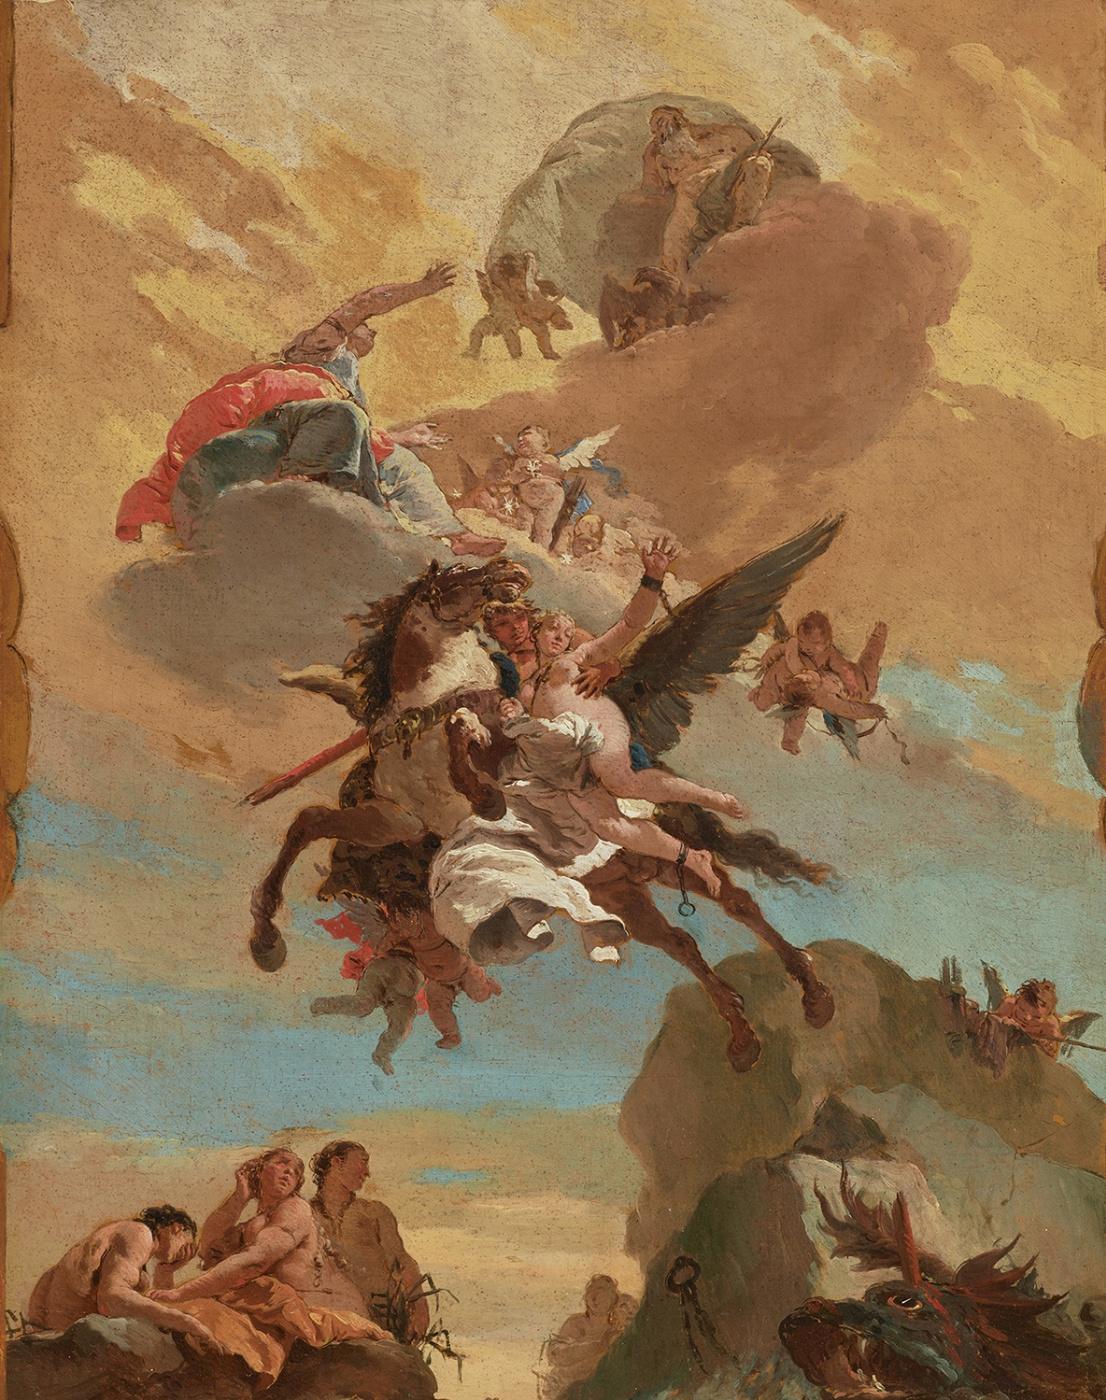 Giovanni Battista Tiepolo. Perseus and Andromeda. Sketch